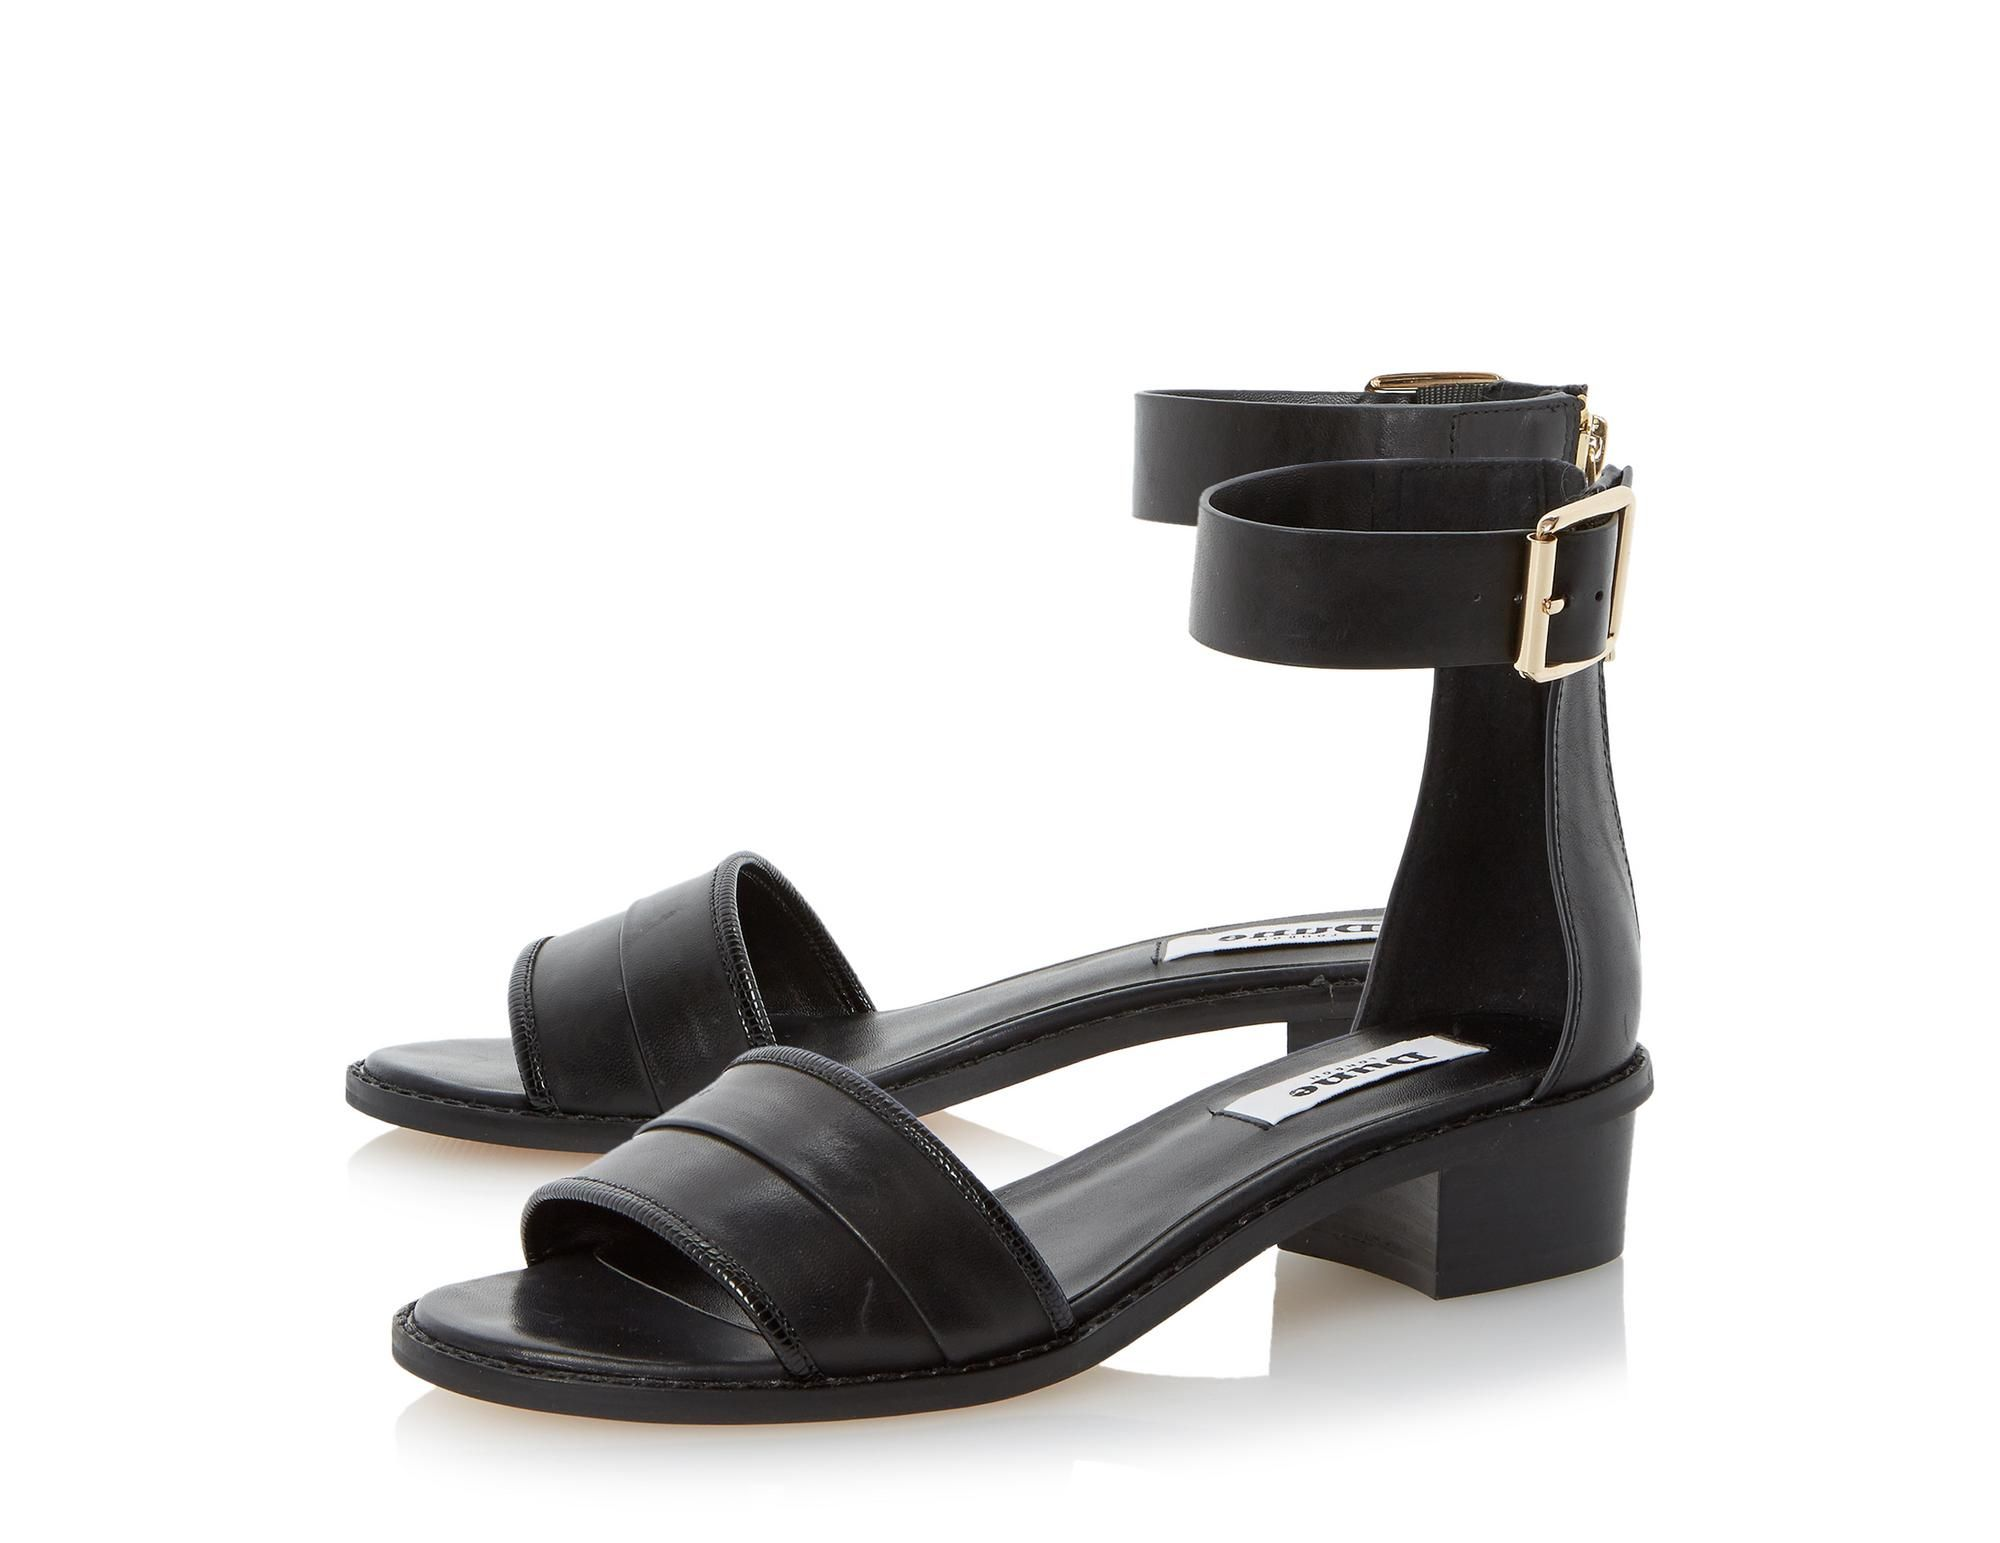 Black sandals dune - Dune Ladies Jools Low Block Heel Ankle Strap Leather Sandal Black Dune Shoes